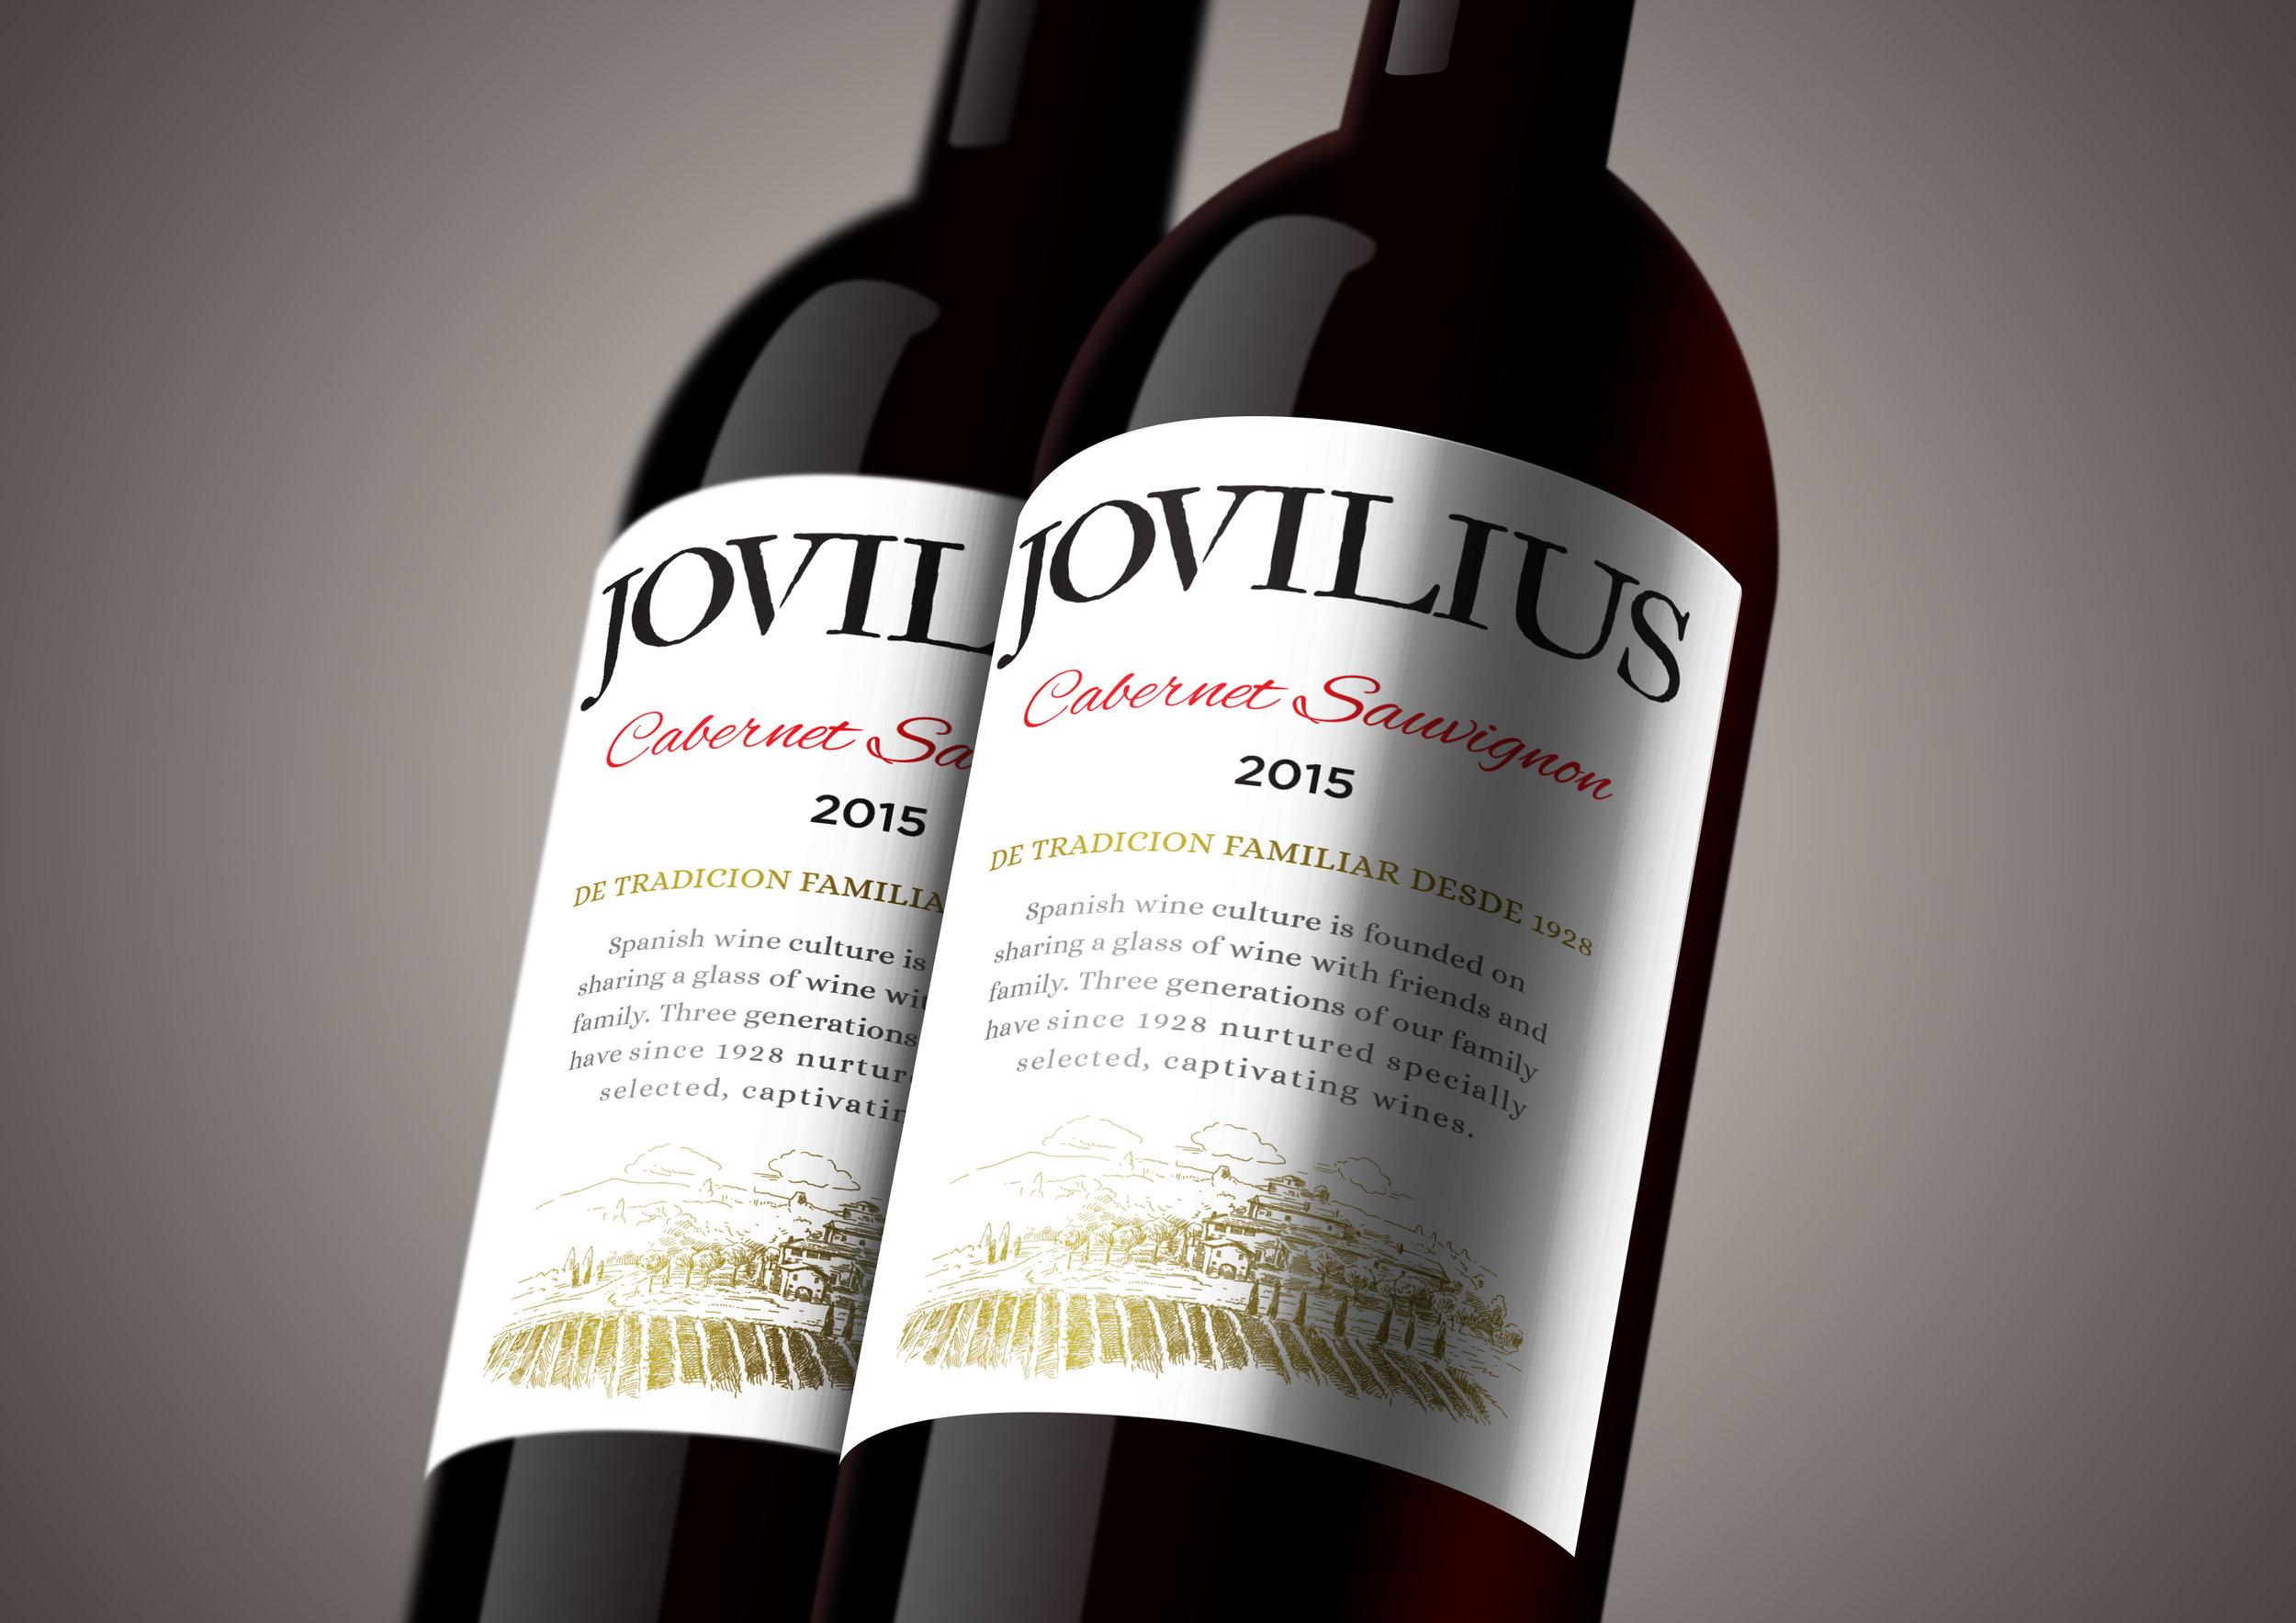 Jovilius 2 bottle shot.jpg